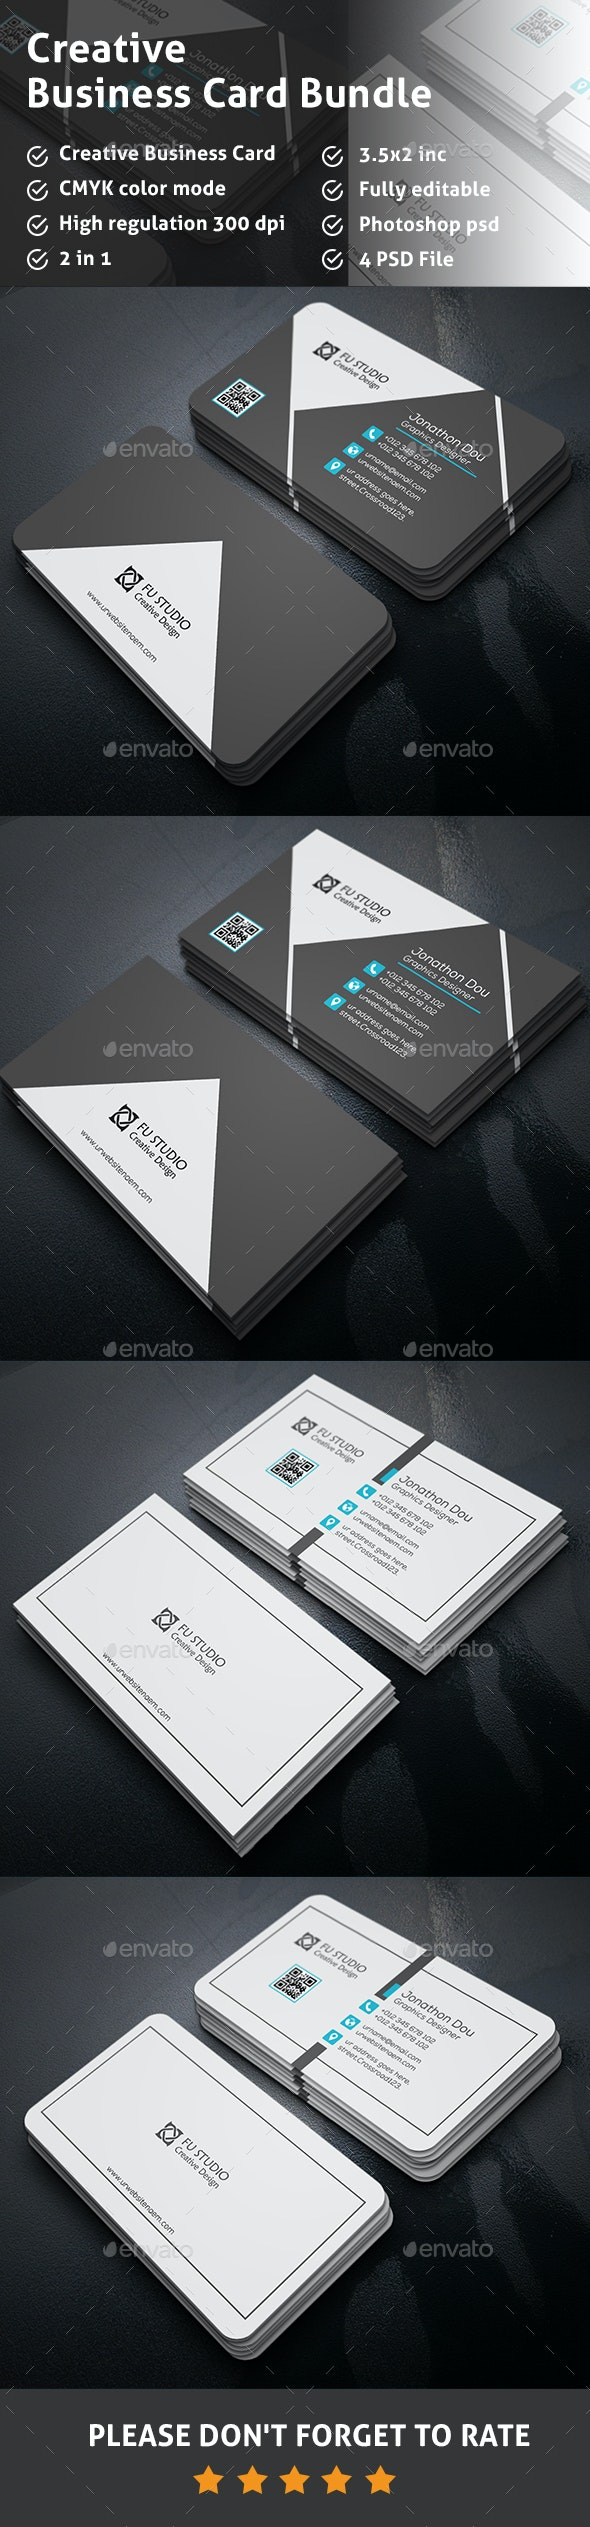 Business Card Bundle - Creative Business Cards